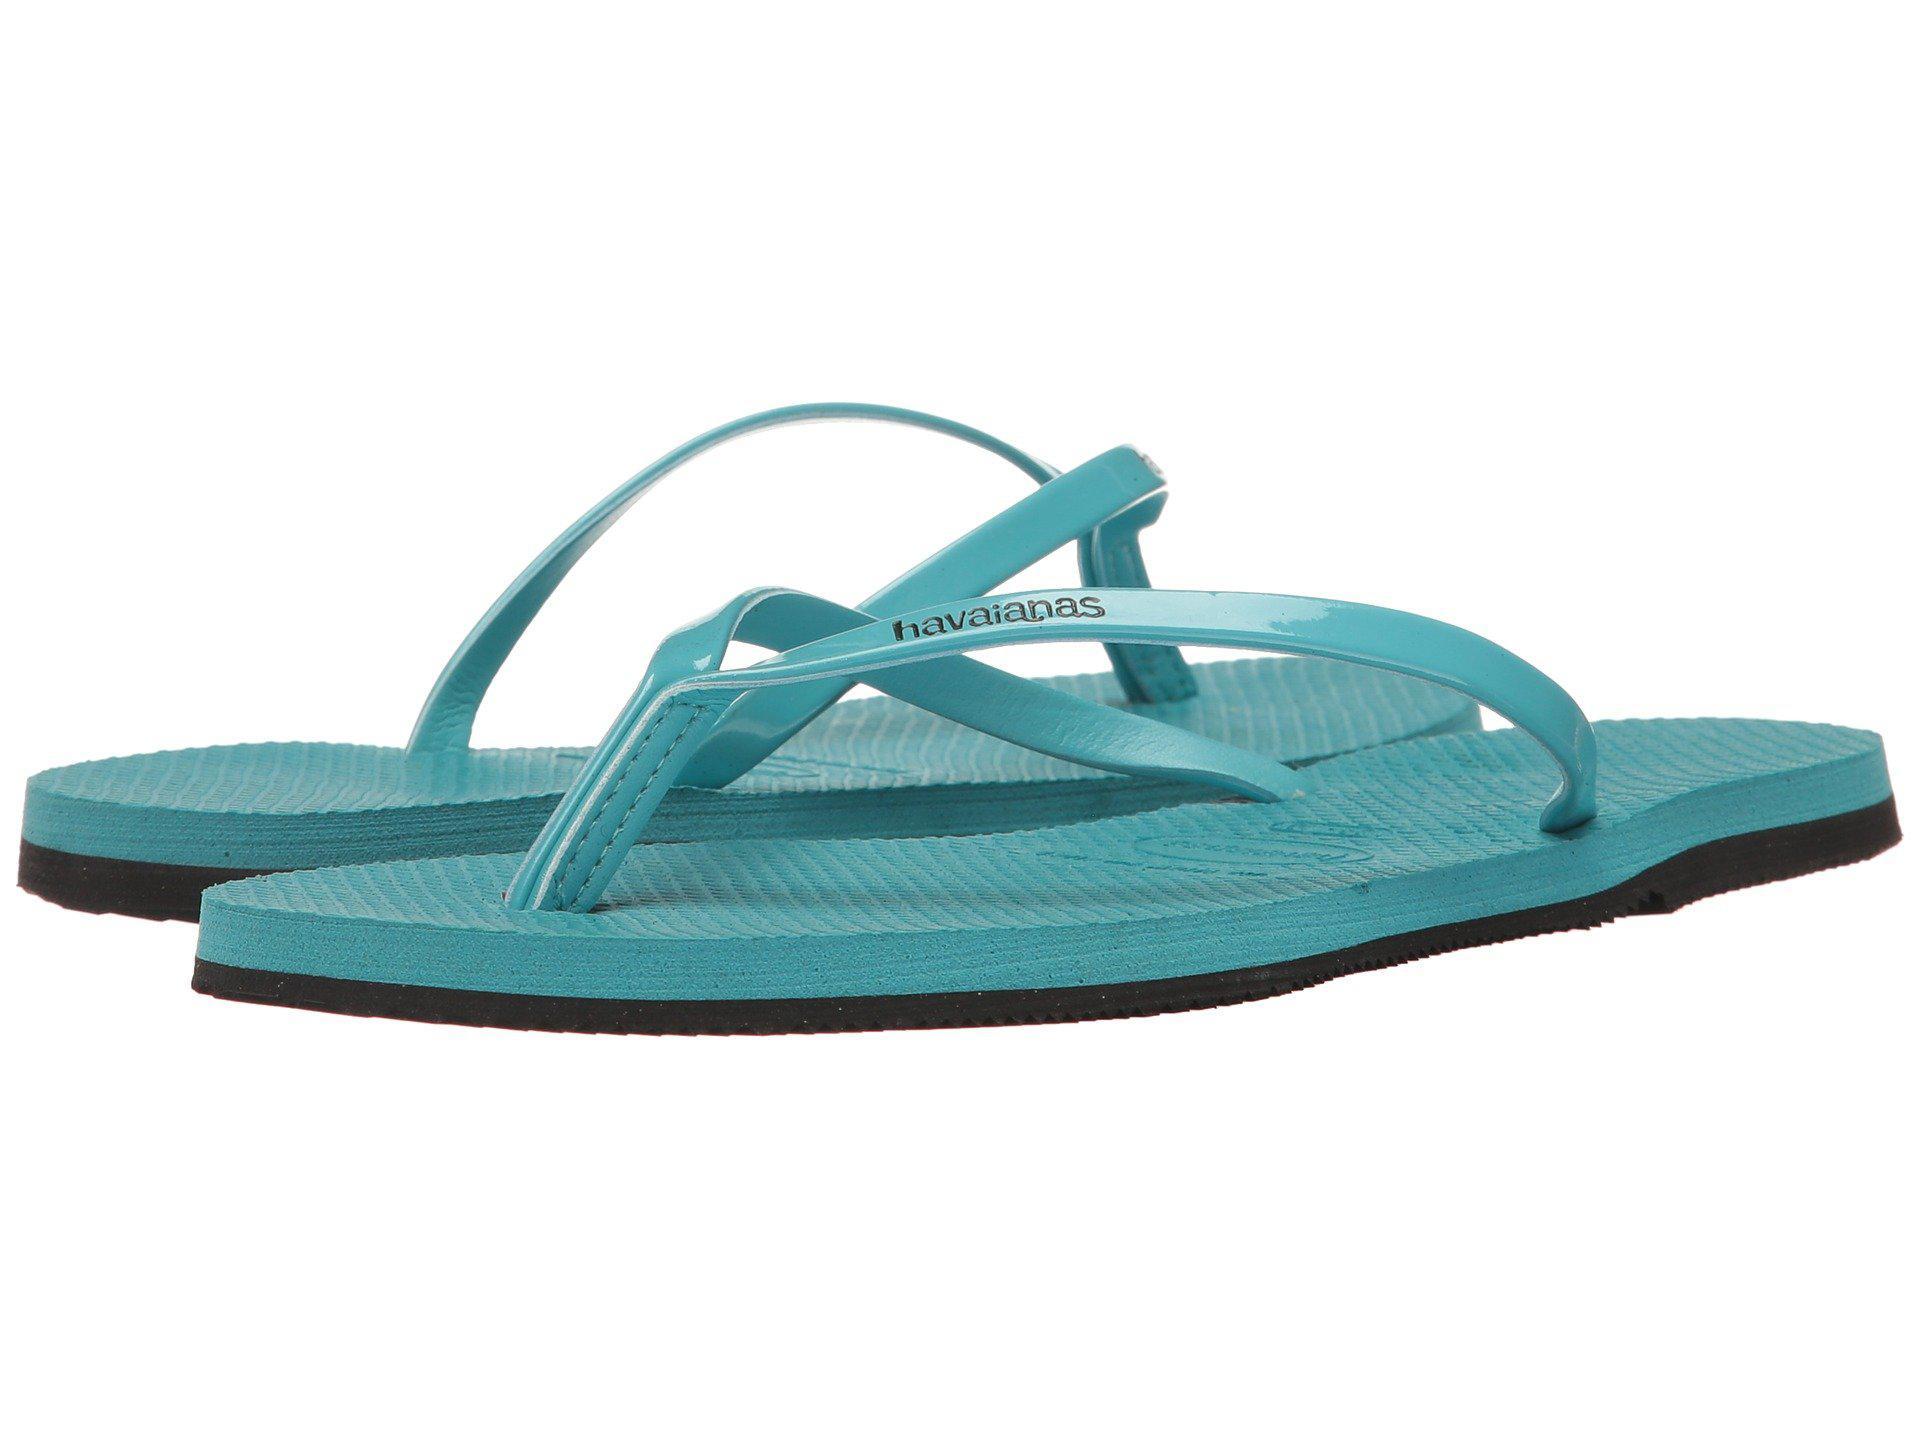 b9dfcfc6c9e916 Lyst - Havaianas You Metallic Flip Flops in Blue